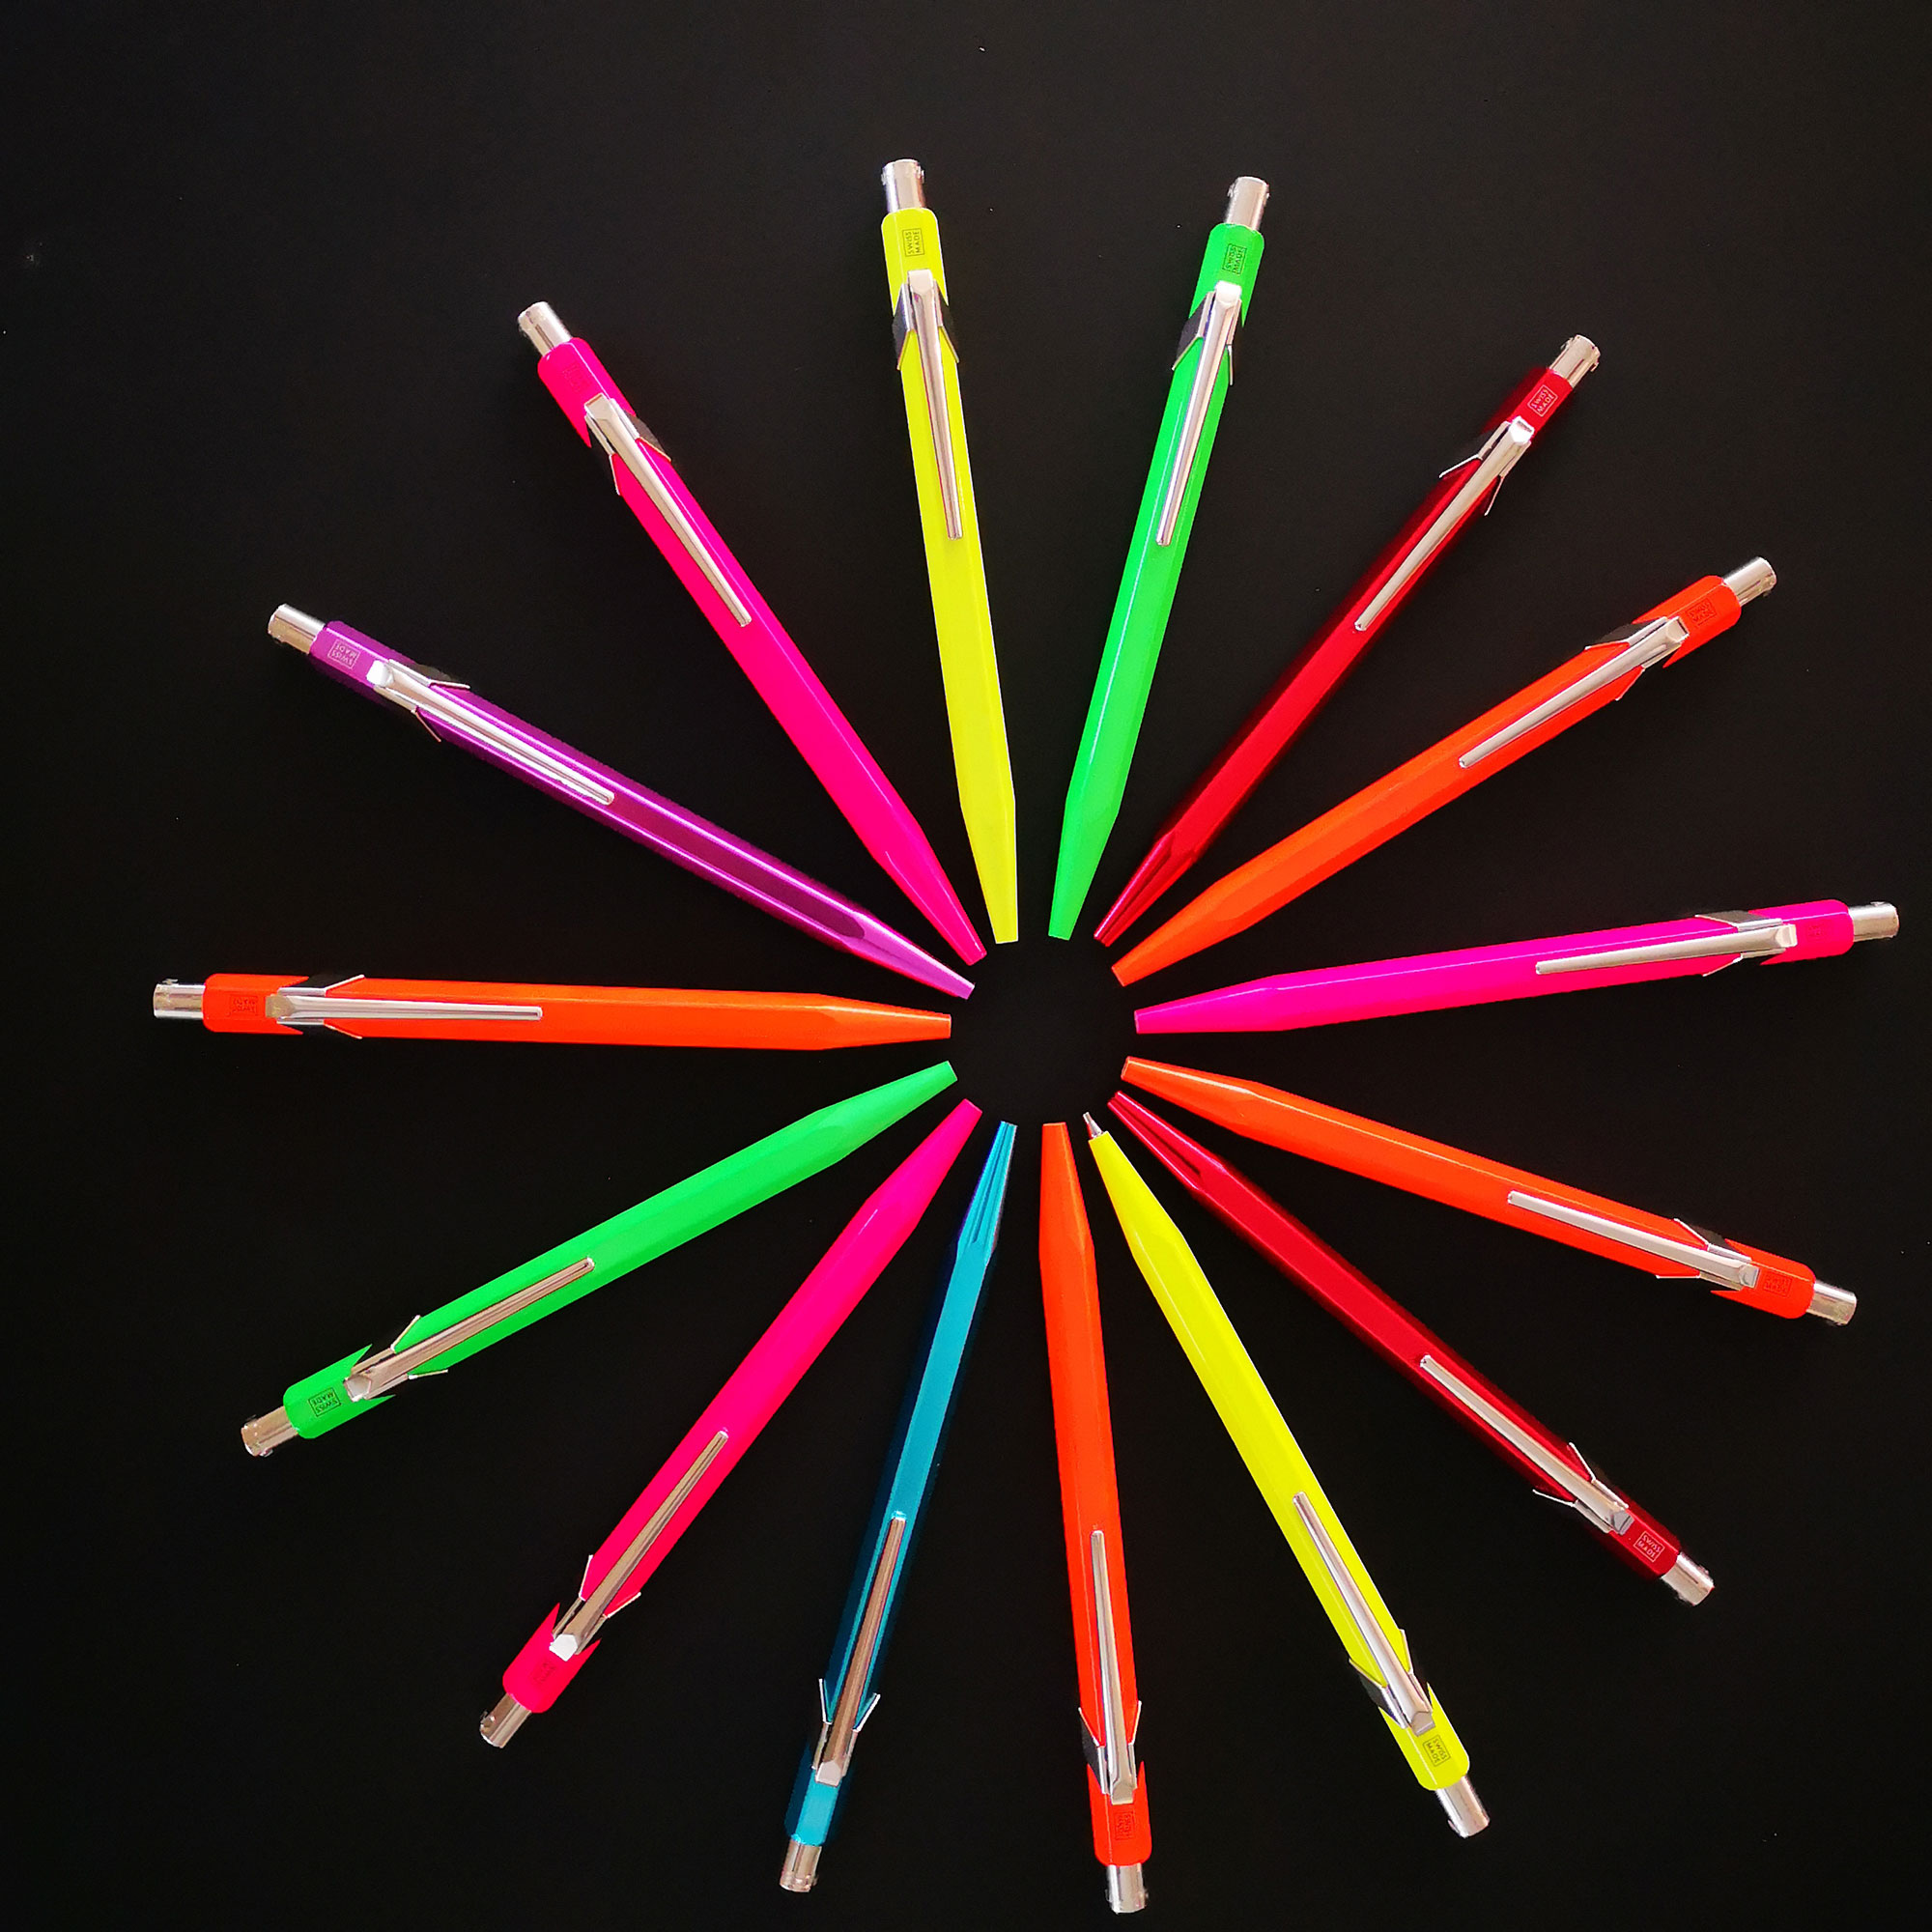 Kugelschreiber von Caran d'Ache